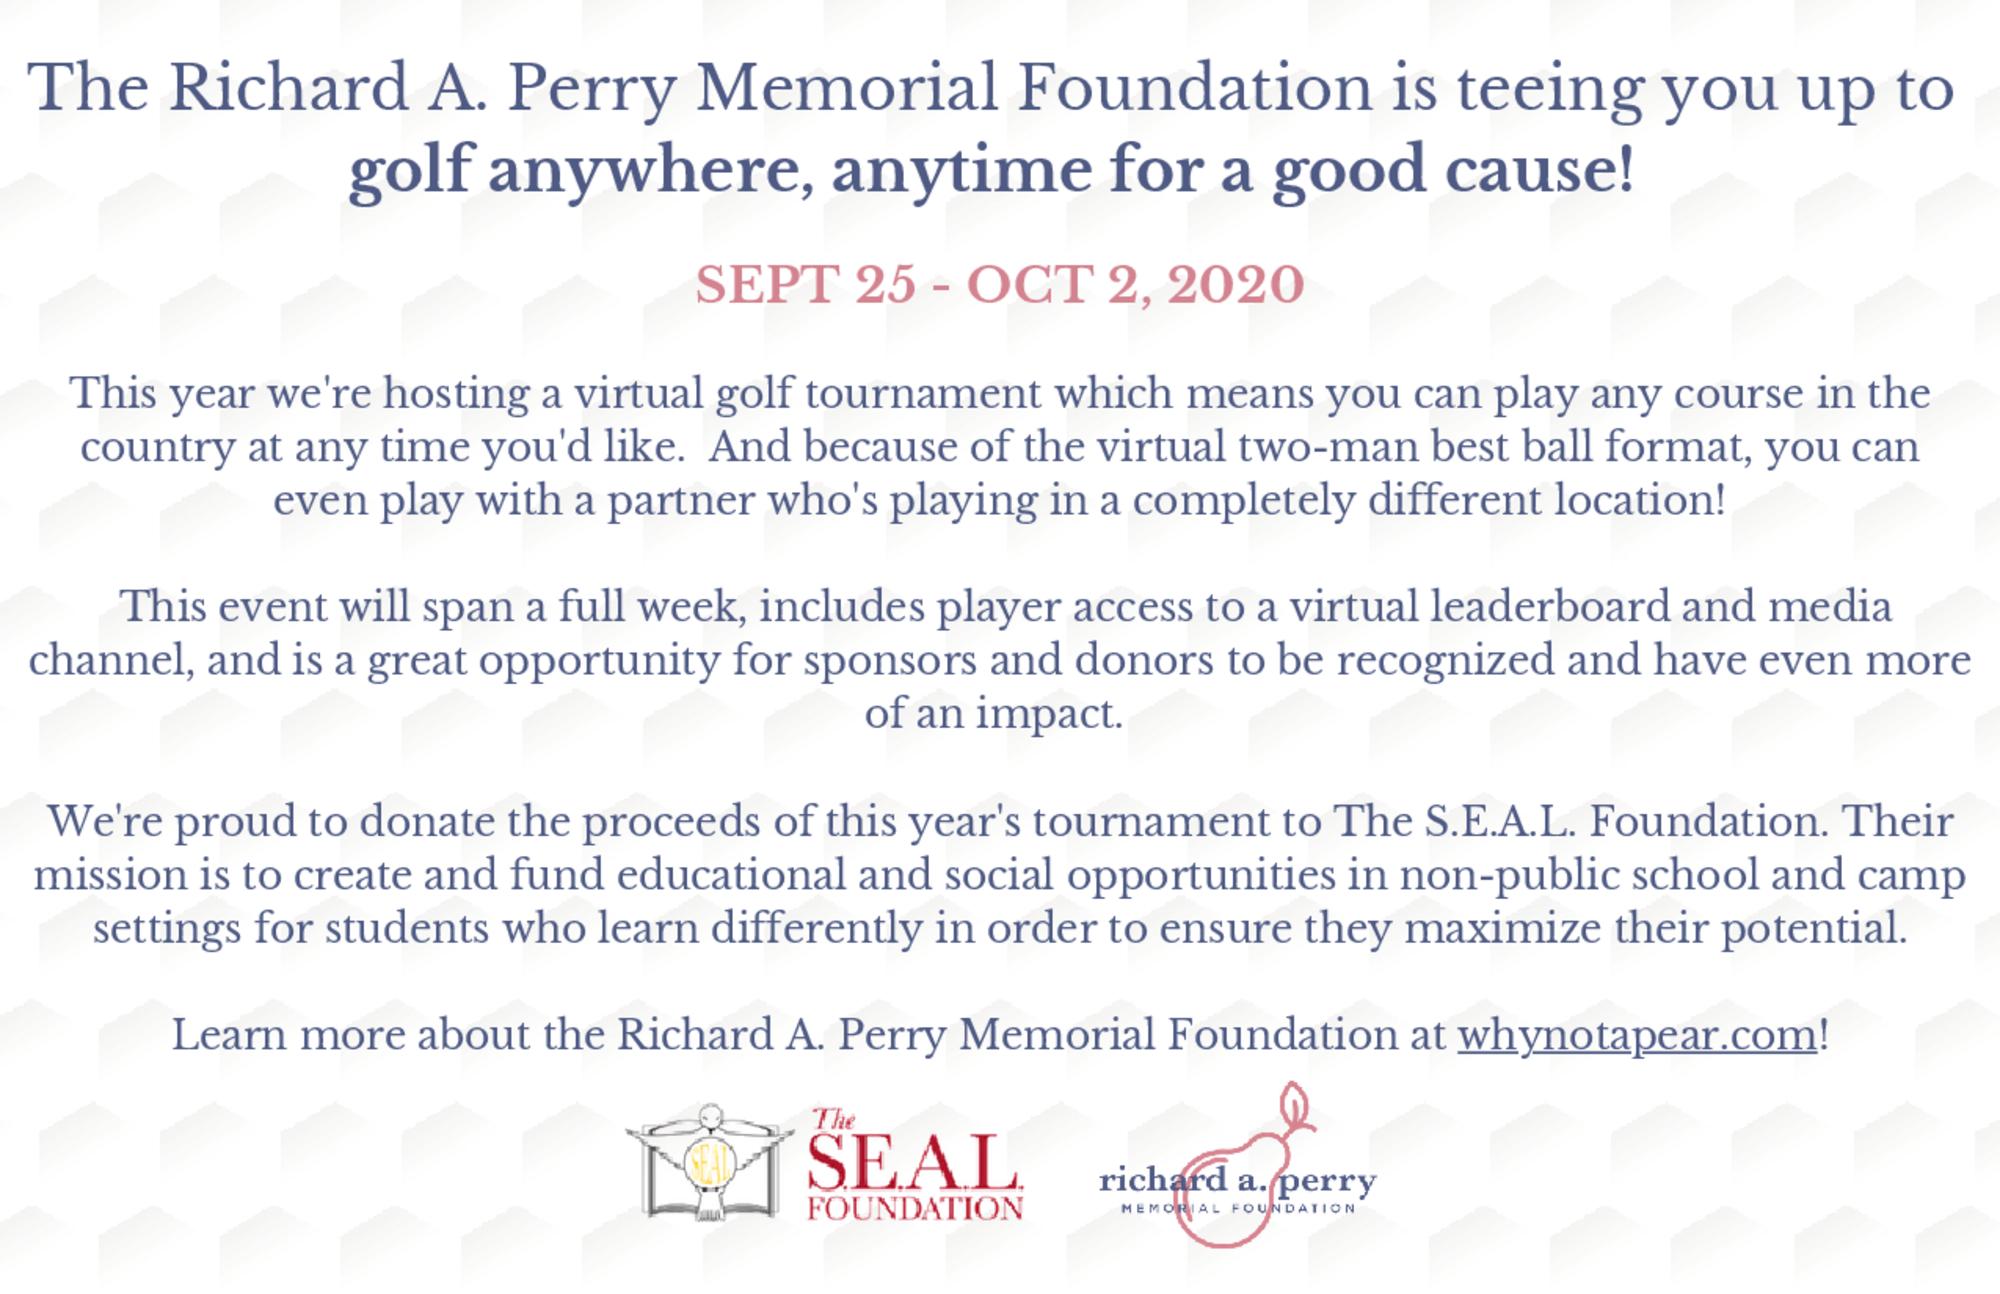 Richard a. perry memorial foundation virtual golf tournament flyer  1  1